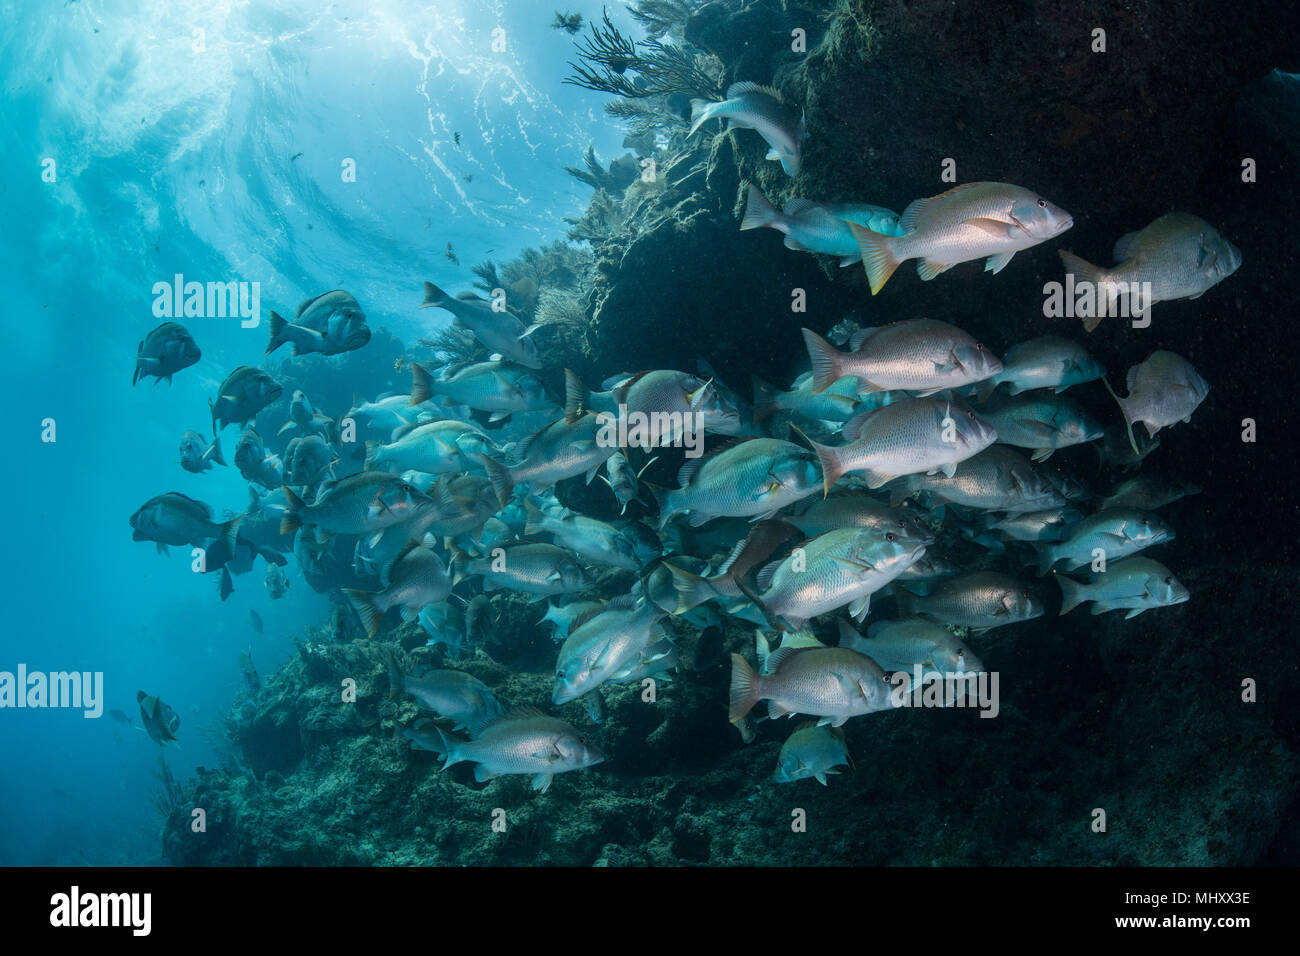 Underwater red snapper rassemblement à shoal mate, Quintana Roo, Mexique Banque D'Images